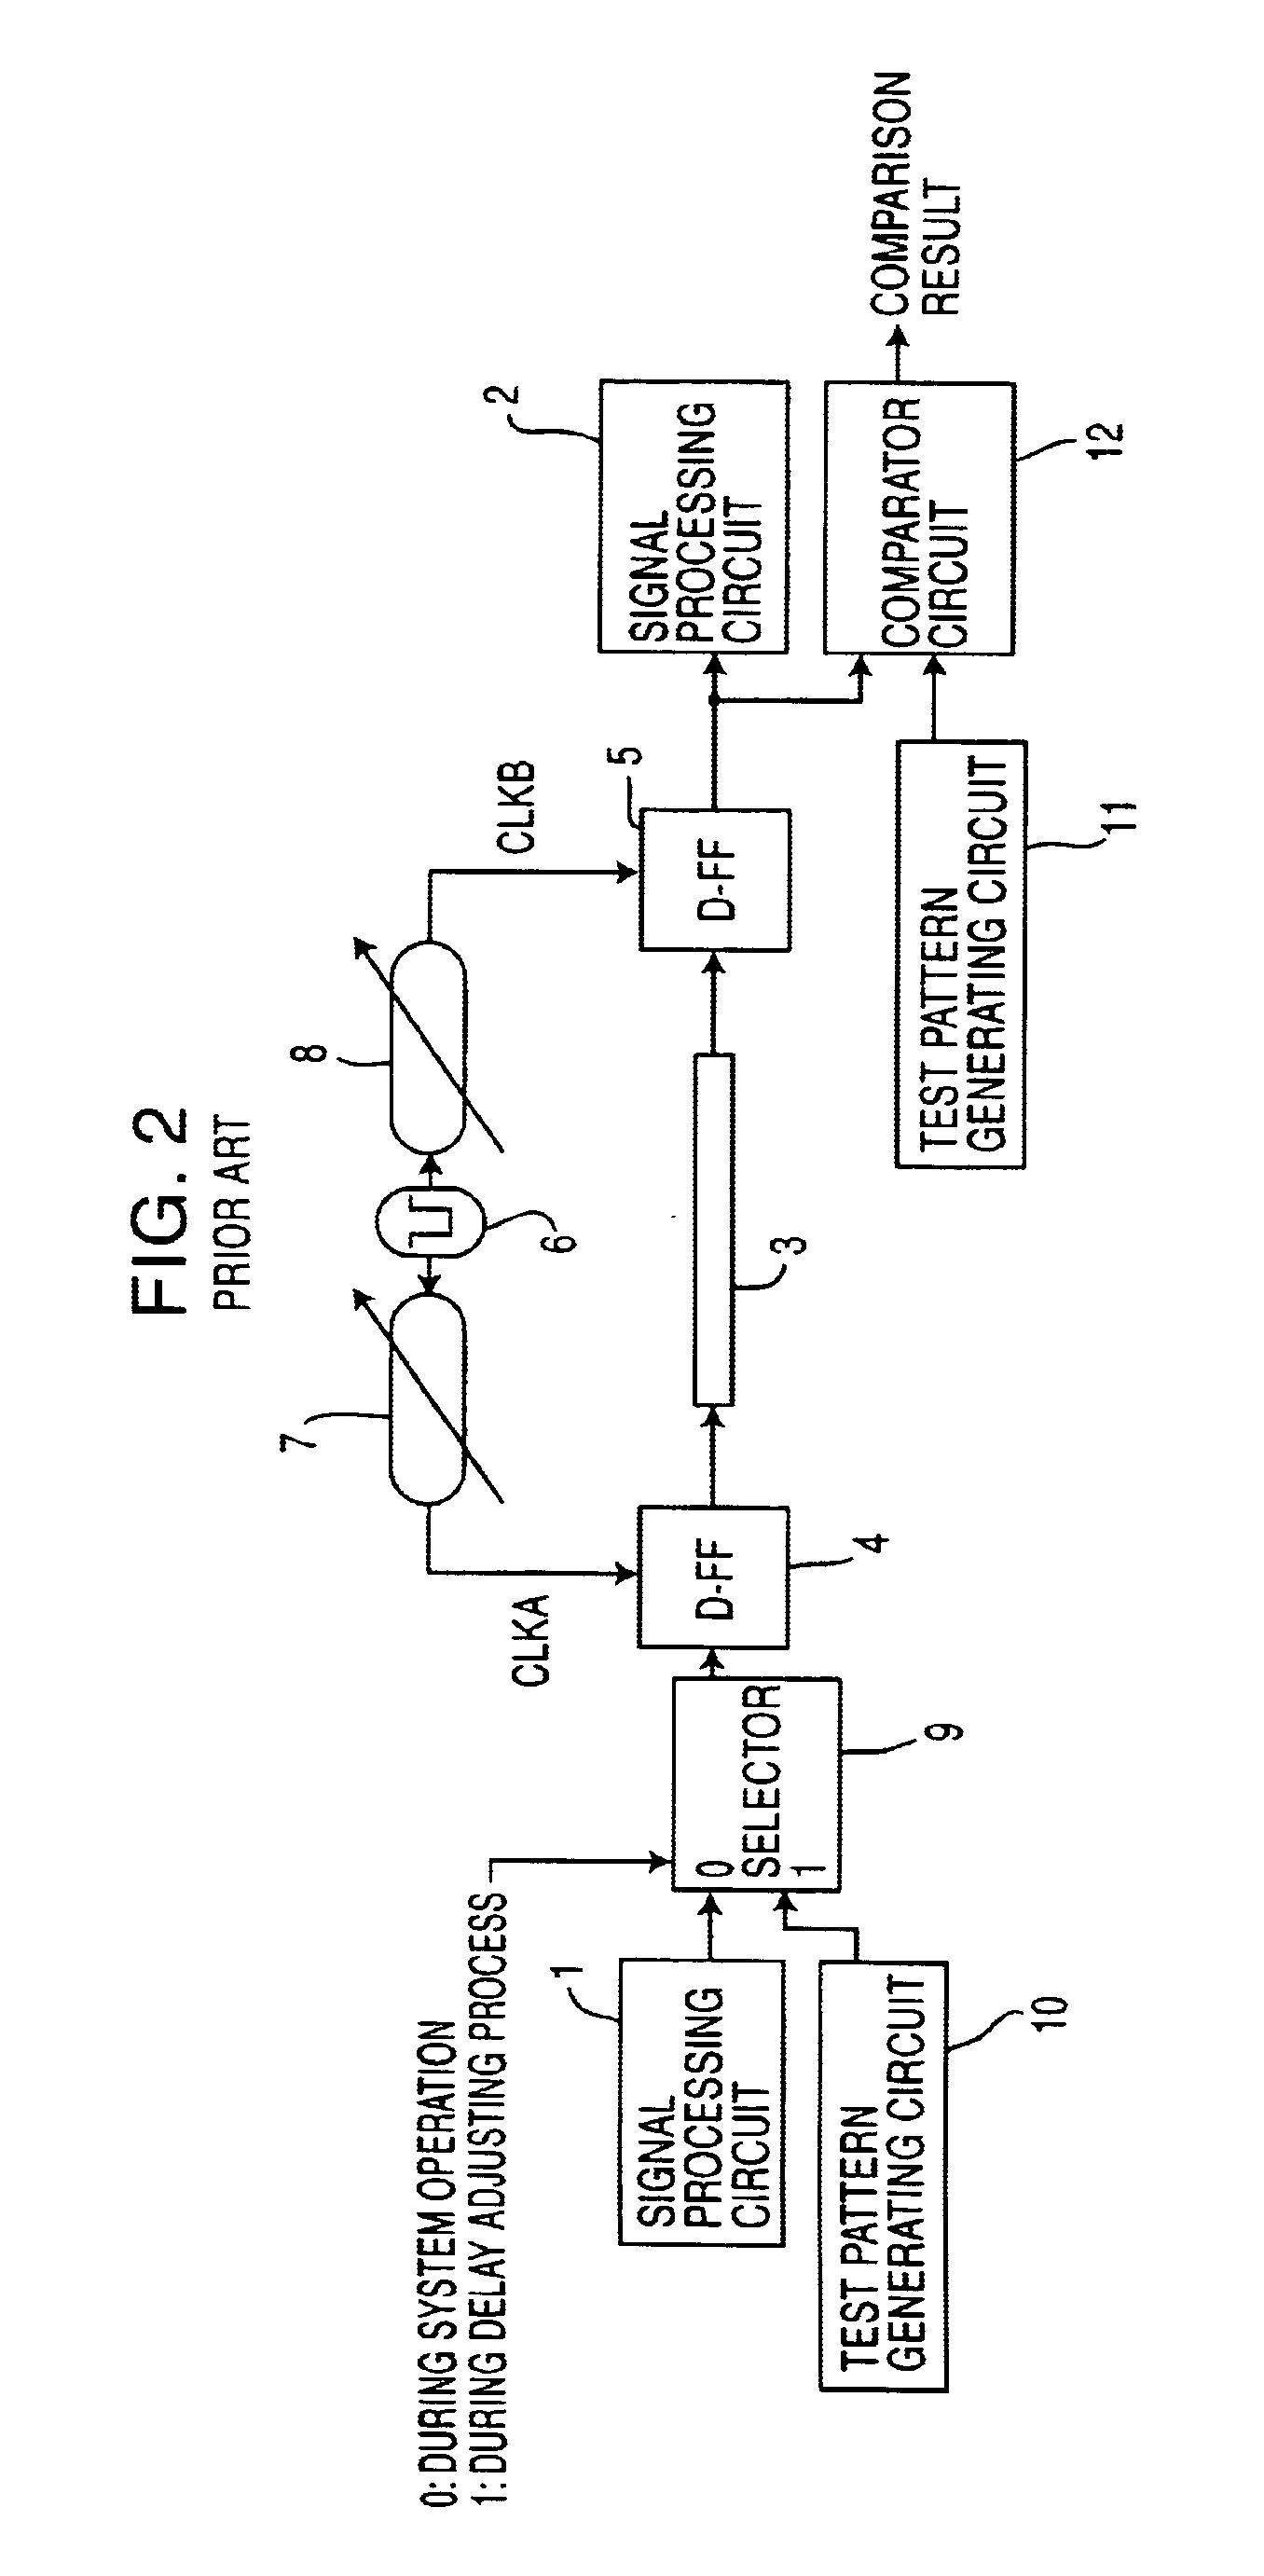 Patente Us6735732 Clock Adjusting Method And Circuit Device D Ff Diagram Patent Drawing